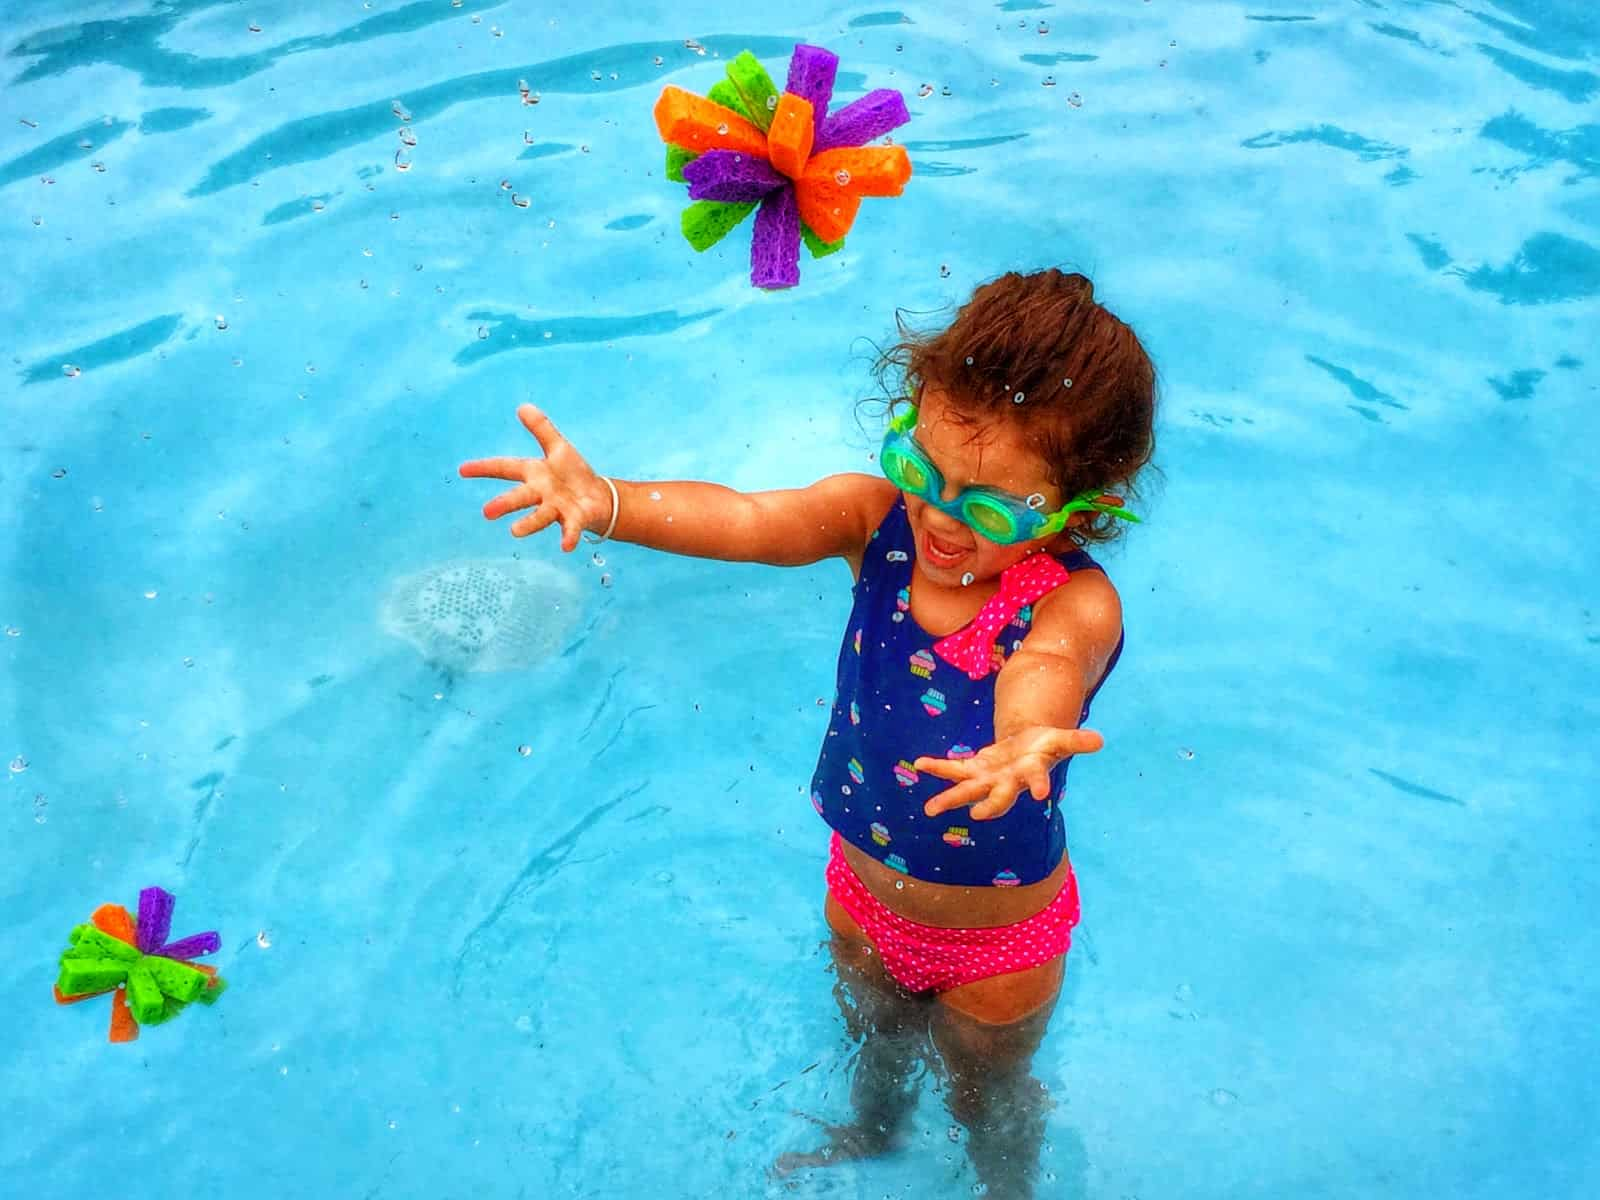 Wet water sponge toys